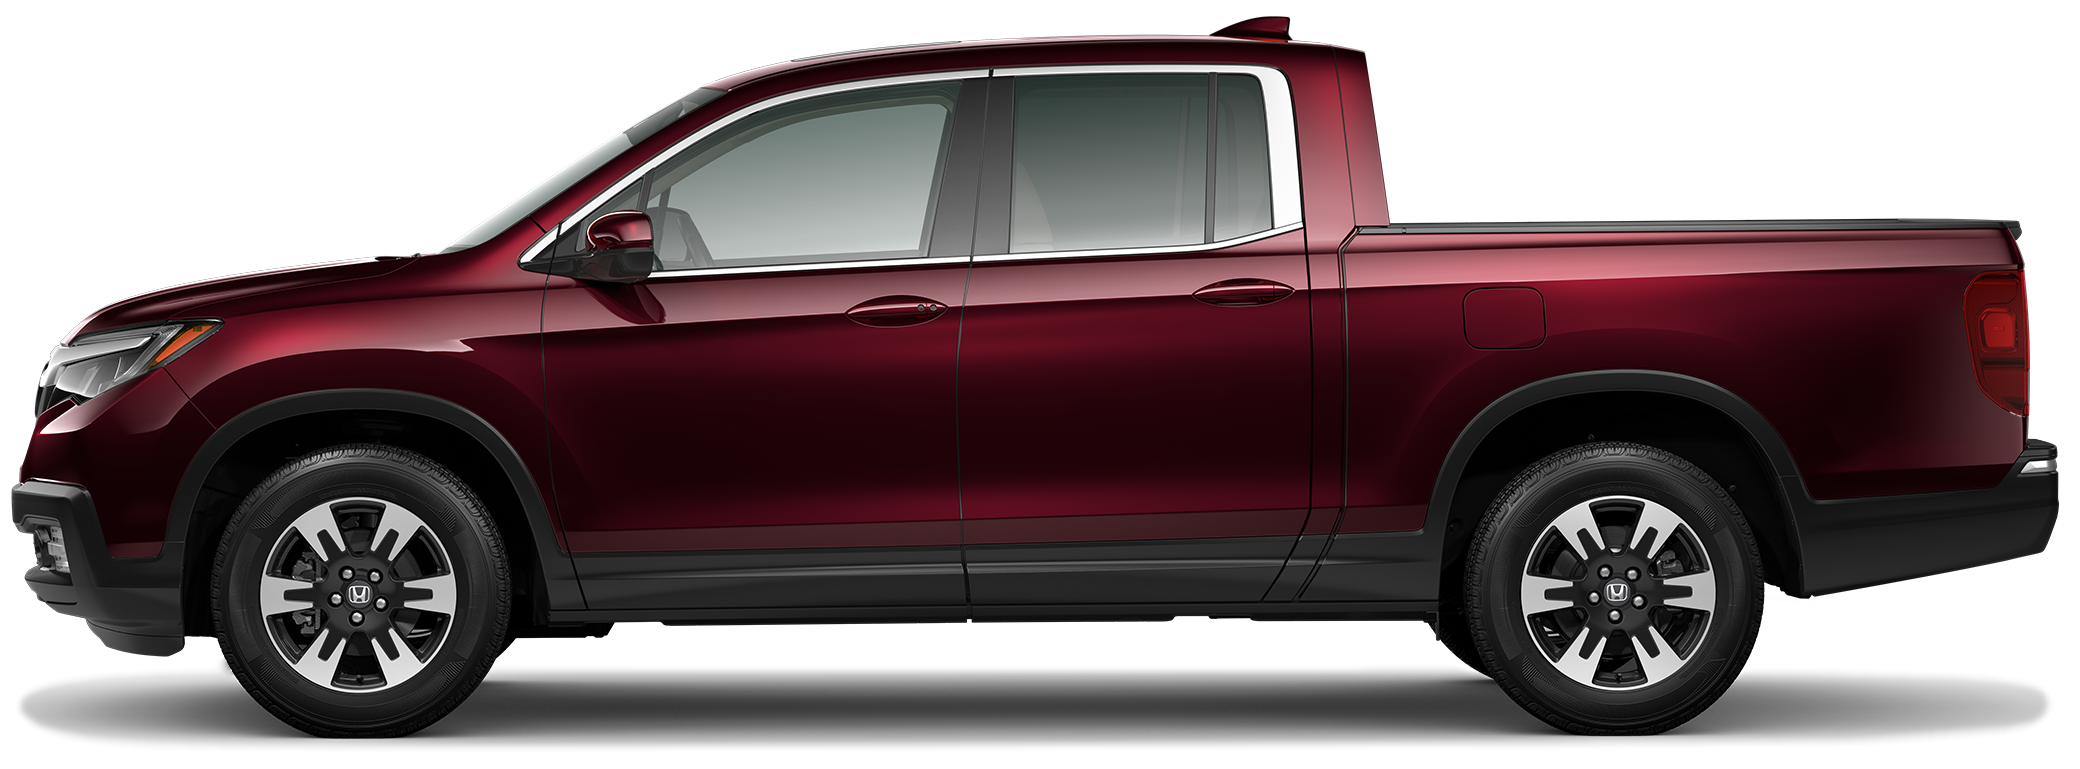 2020 Honda Ridgeline Truck RTL